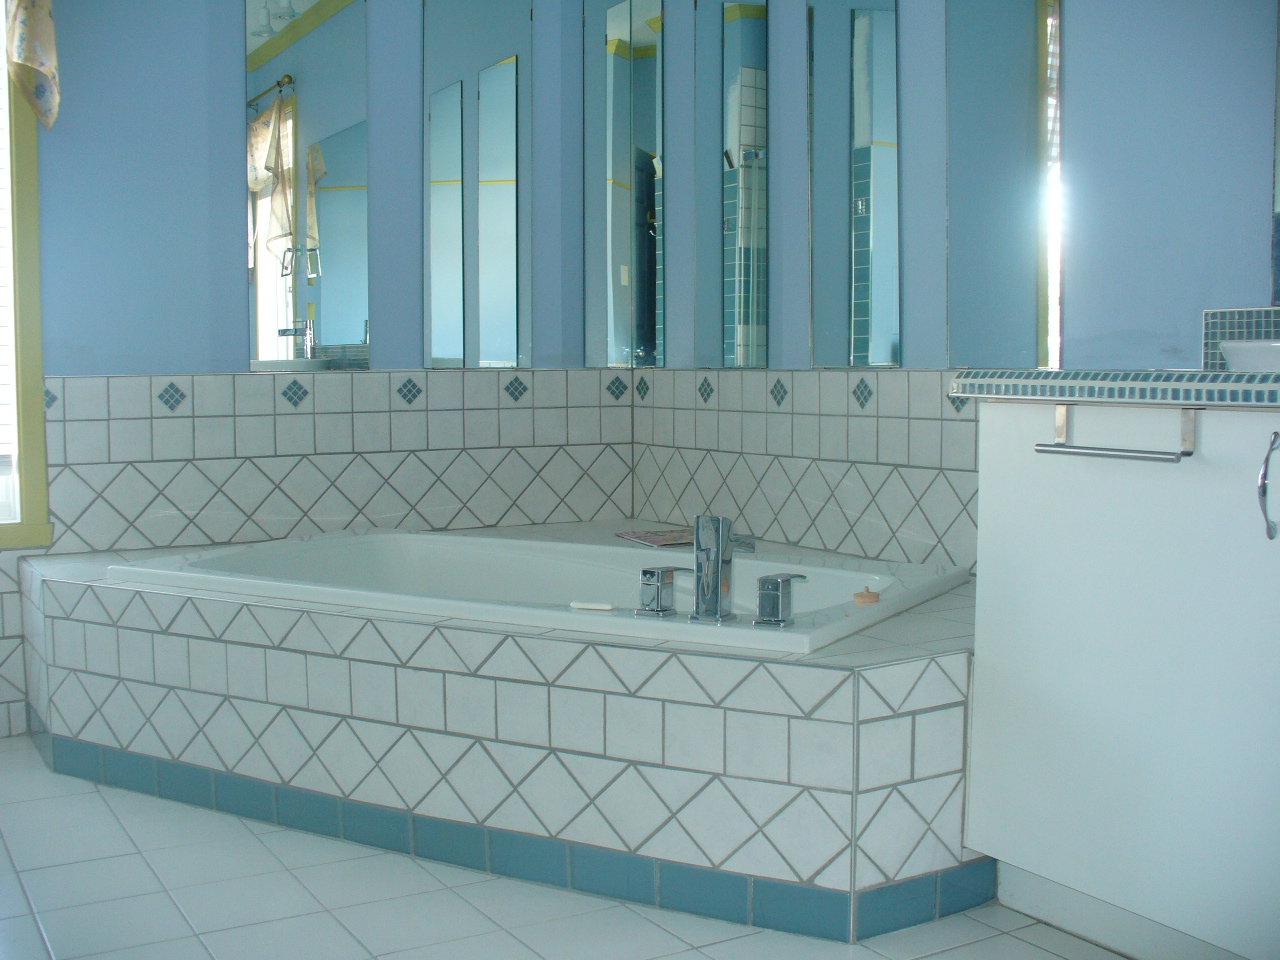 Carrelage douche salle de bain for Carrelage ceramique salle de bain